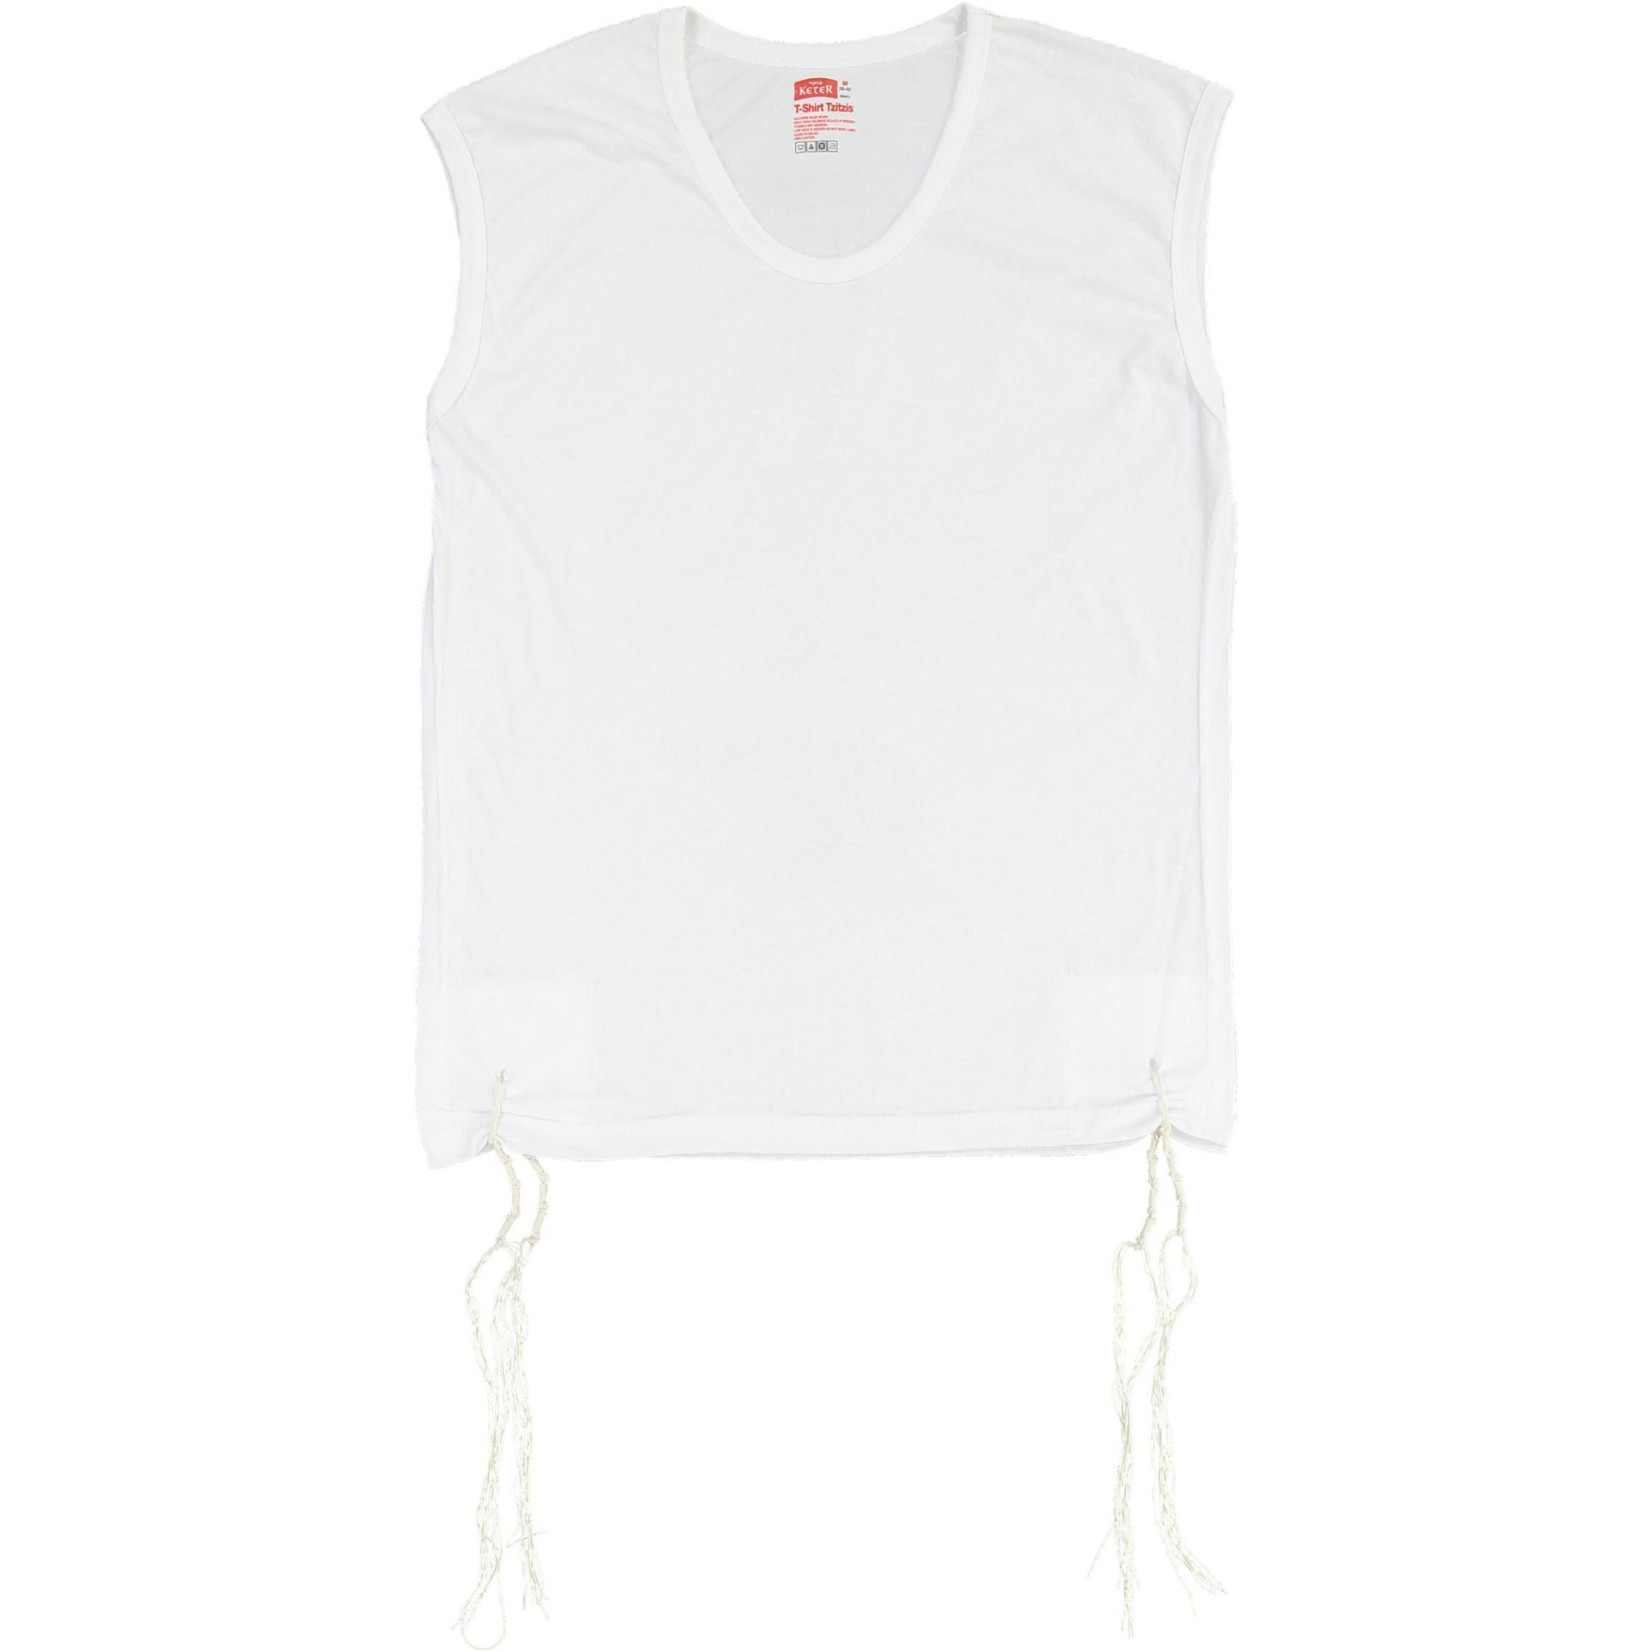 Undershirt-Style Arbah Kanfot, 100% Cotton, Round Neck, Size 7